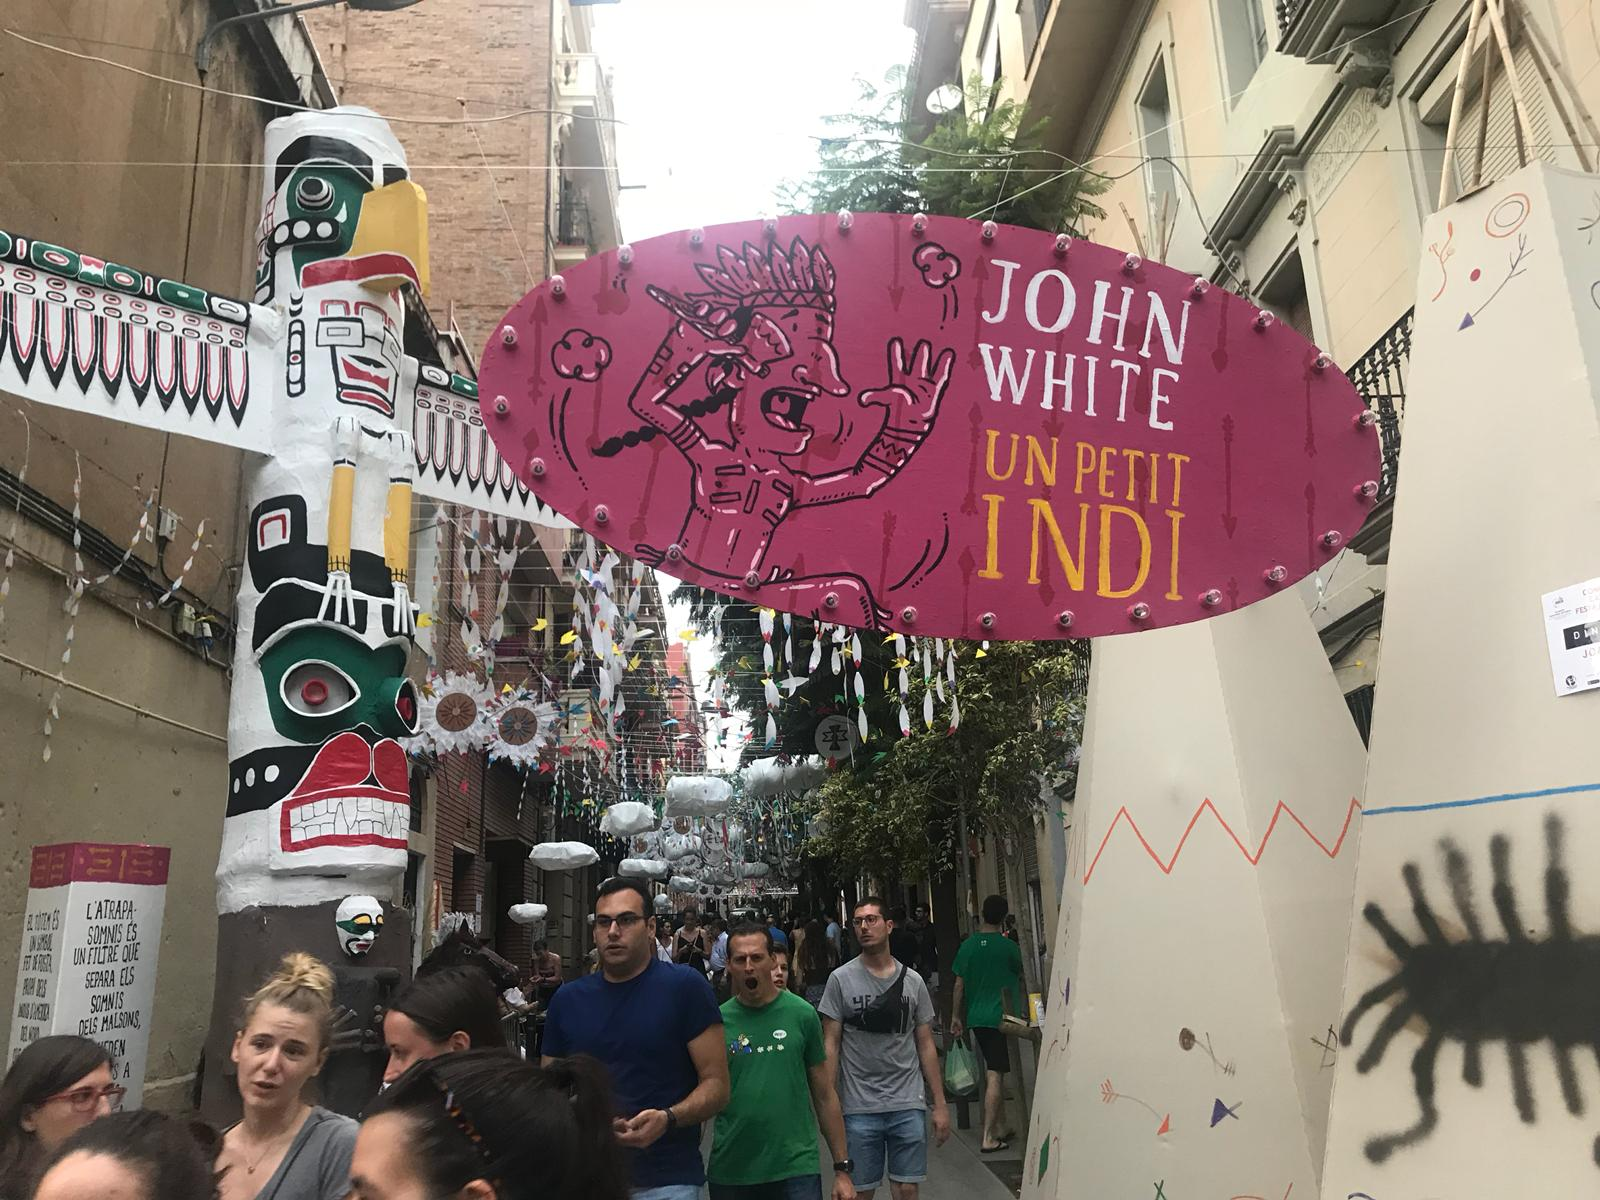 Festa Major de Gràcia - Carrer Joan Blanques - John White un petit indi